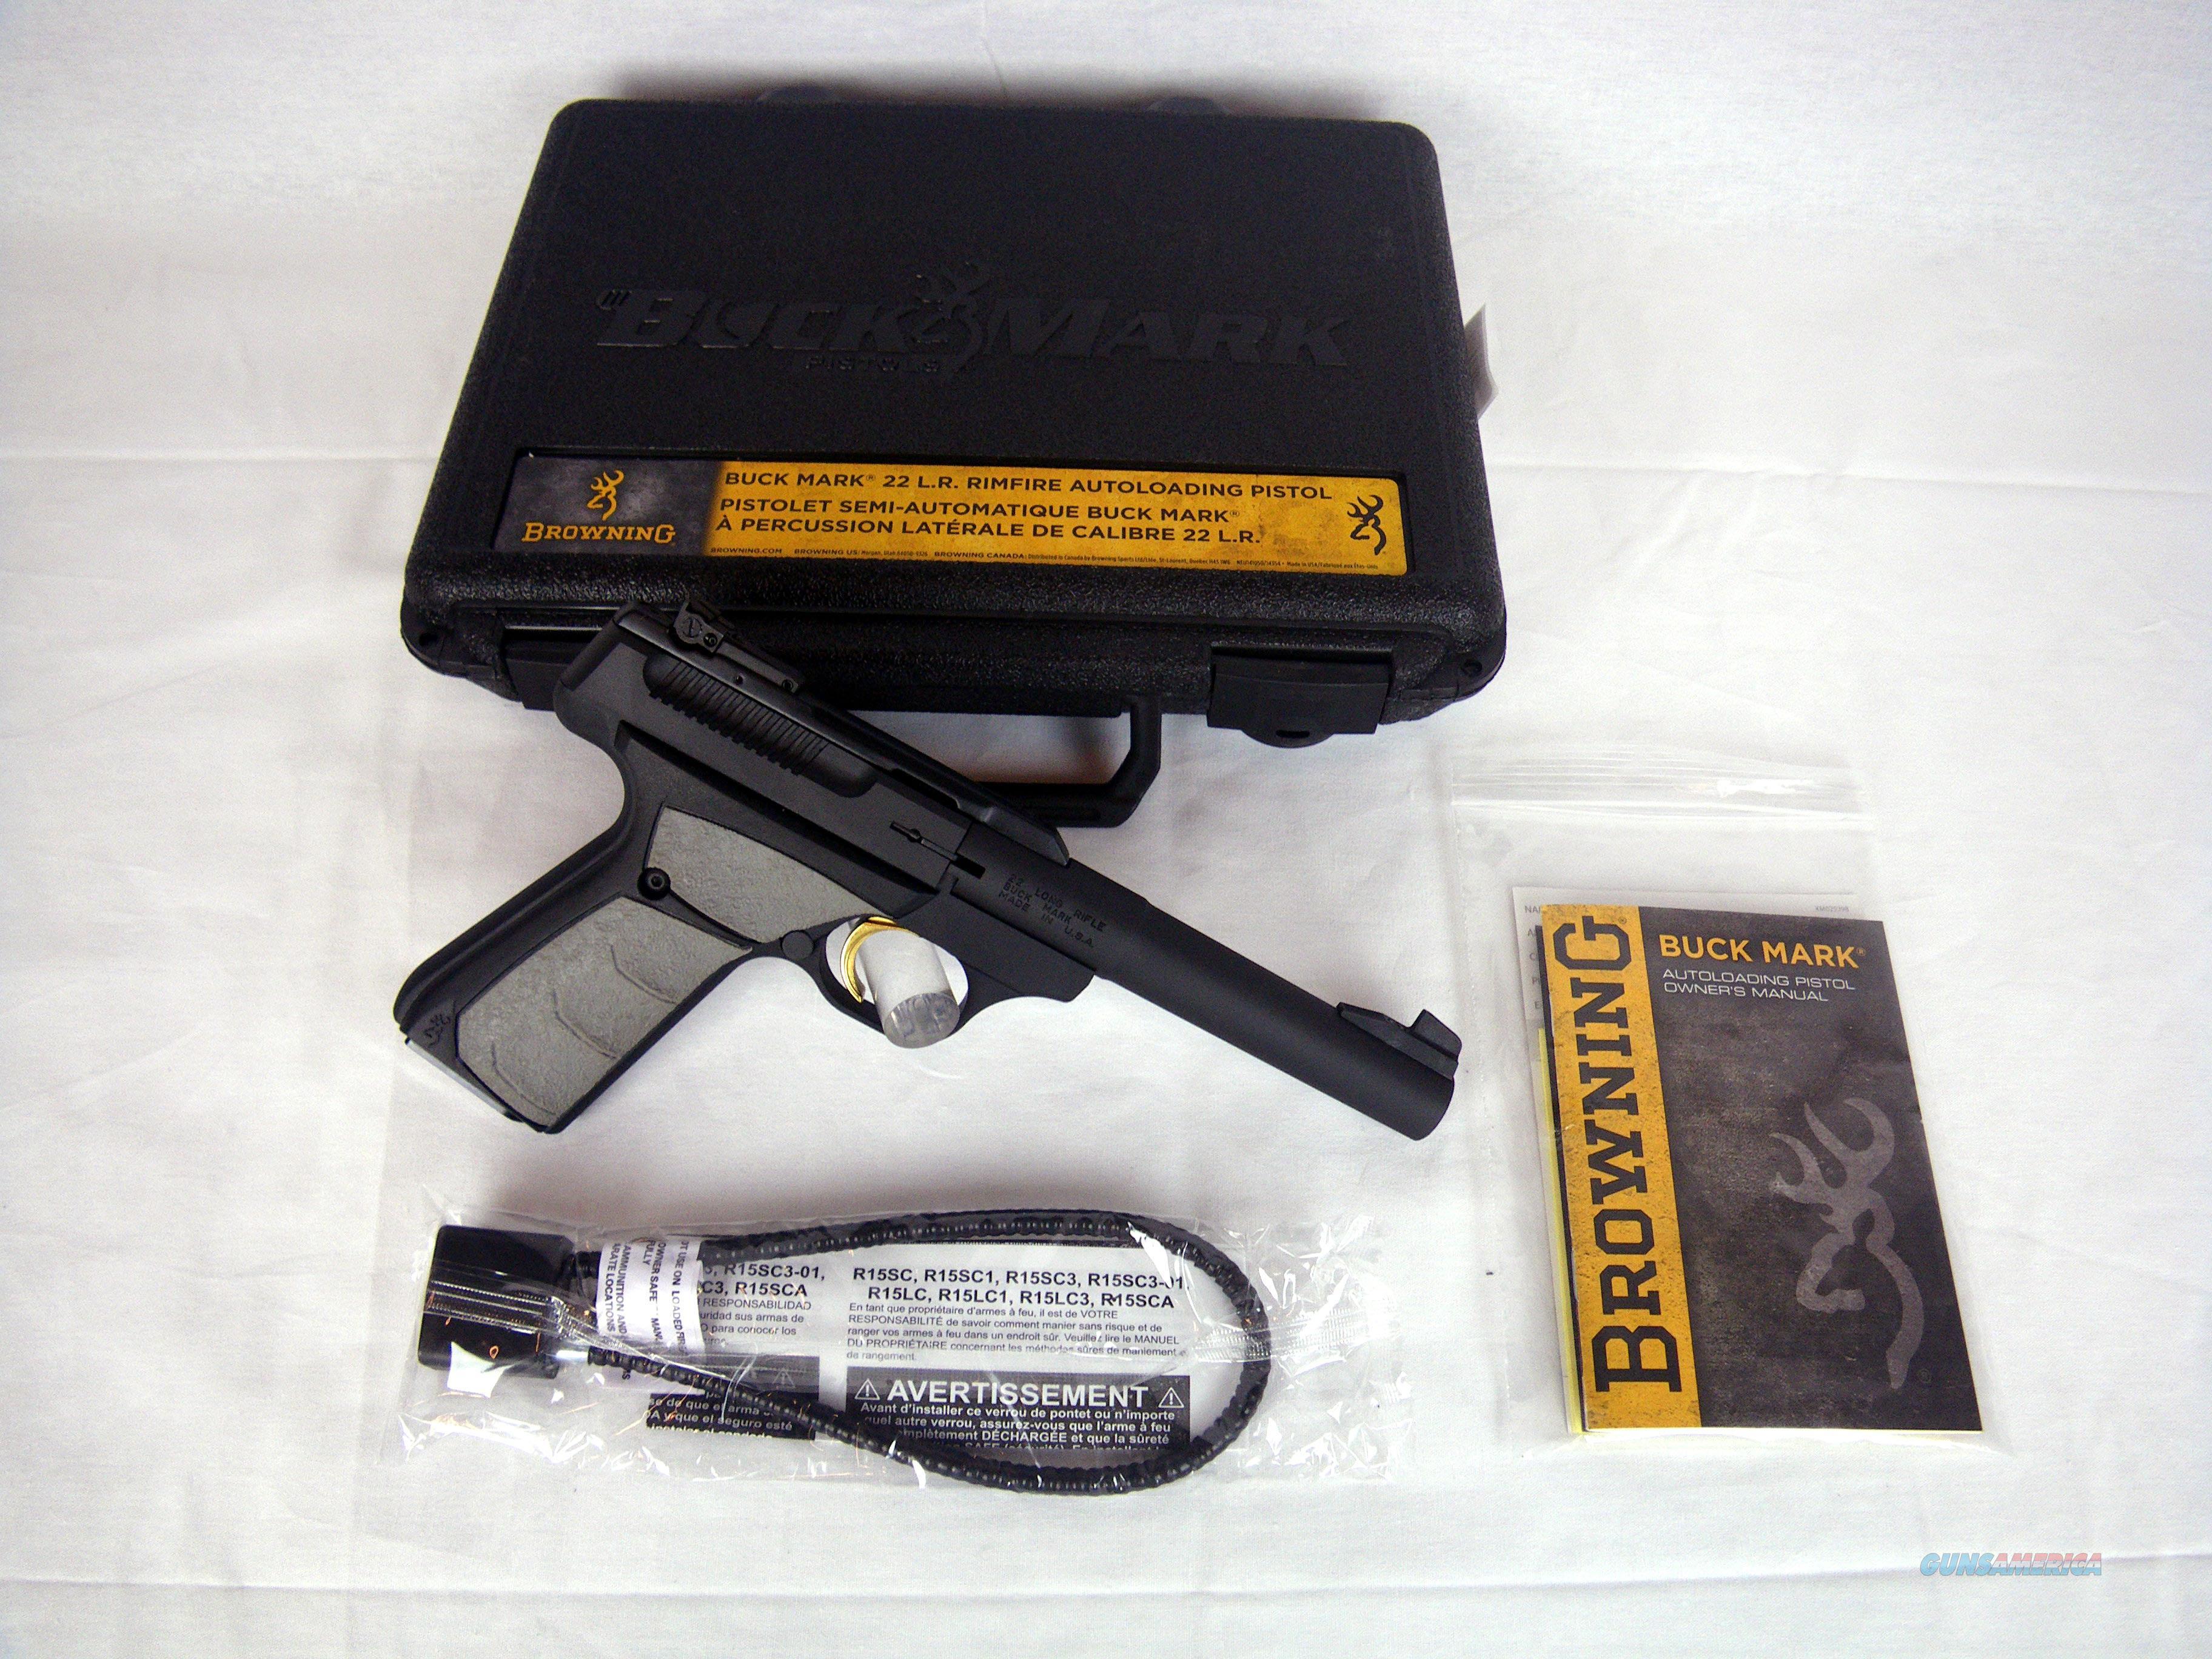 "Browning Buckmark Camper UFX 22lr 5.5"" NEW #051482490  Guns > Pistols > Browning Pistols > Buckmark"